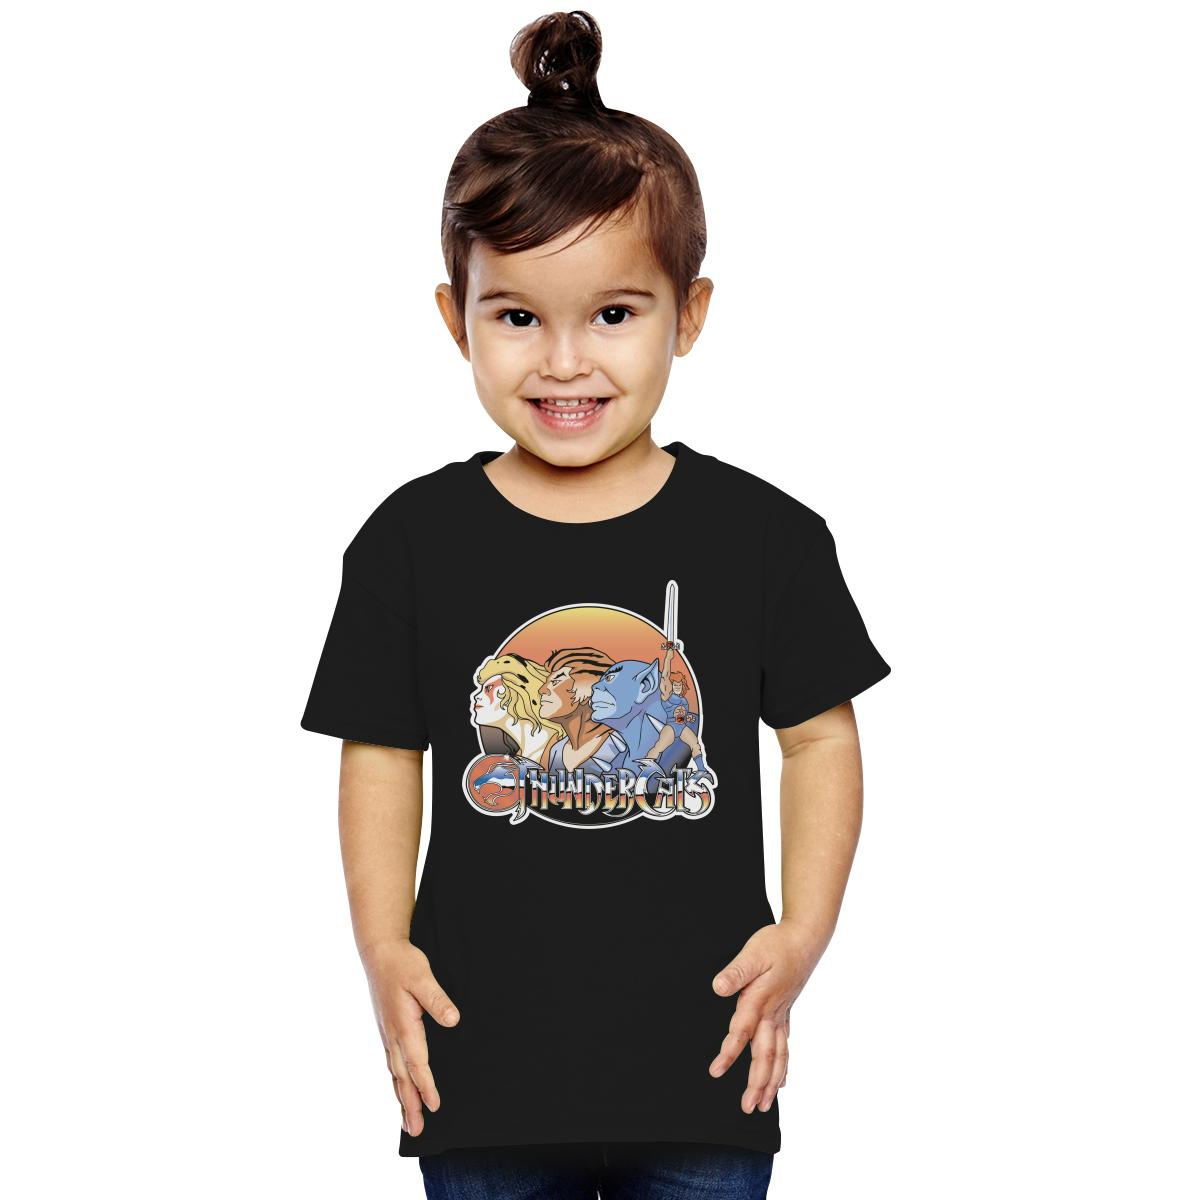 97ab41db75c Thundercats Toddler T-shirt Change style